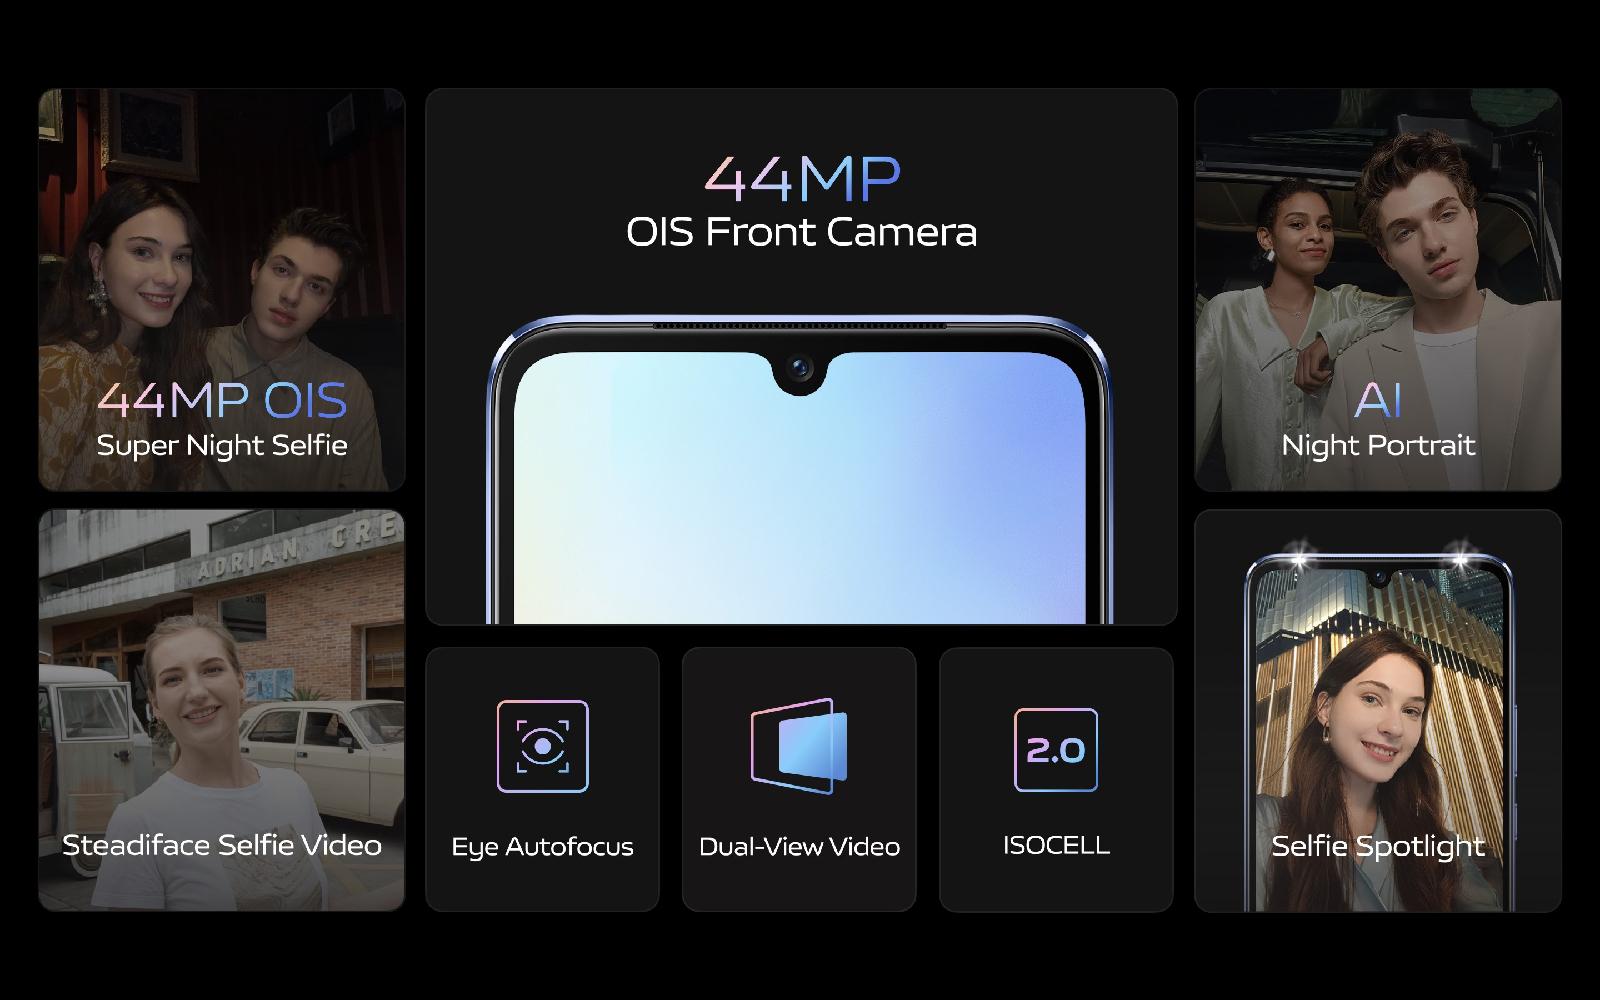 Vivo เปิดตัว V21 5G สมาร์ตโฟนเรือธงรุ่นล่าสุดกล้องหน้า 44MP พร้อมกันสั่น OIS รุ่นแรกจาก Vivo รองรับ 5G กับดีไซน์บางเบาสุดมินิมอล